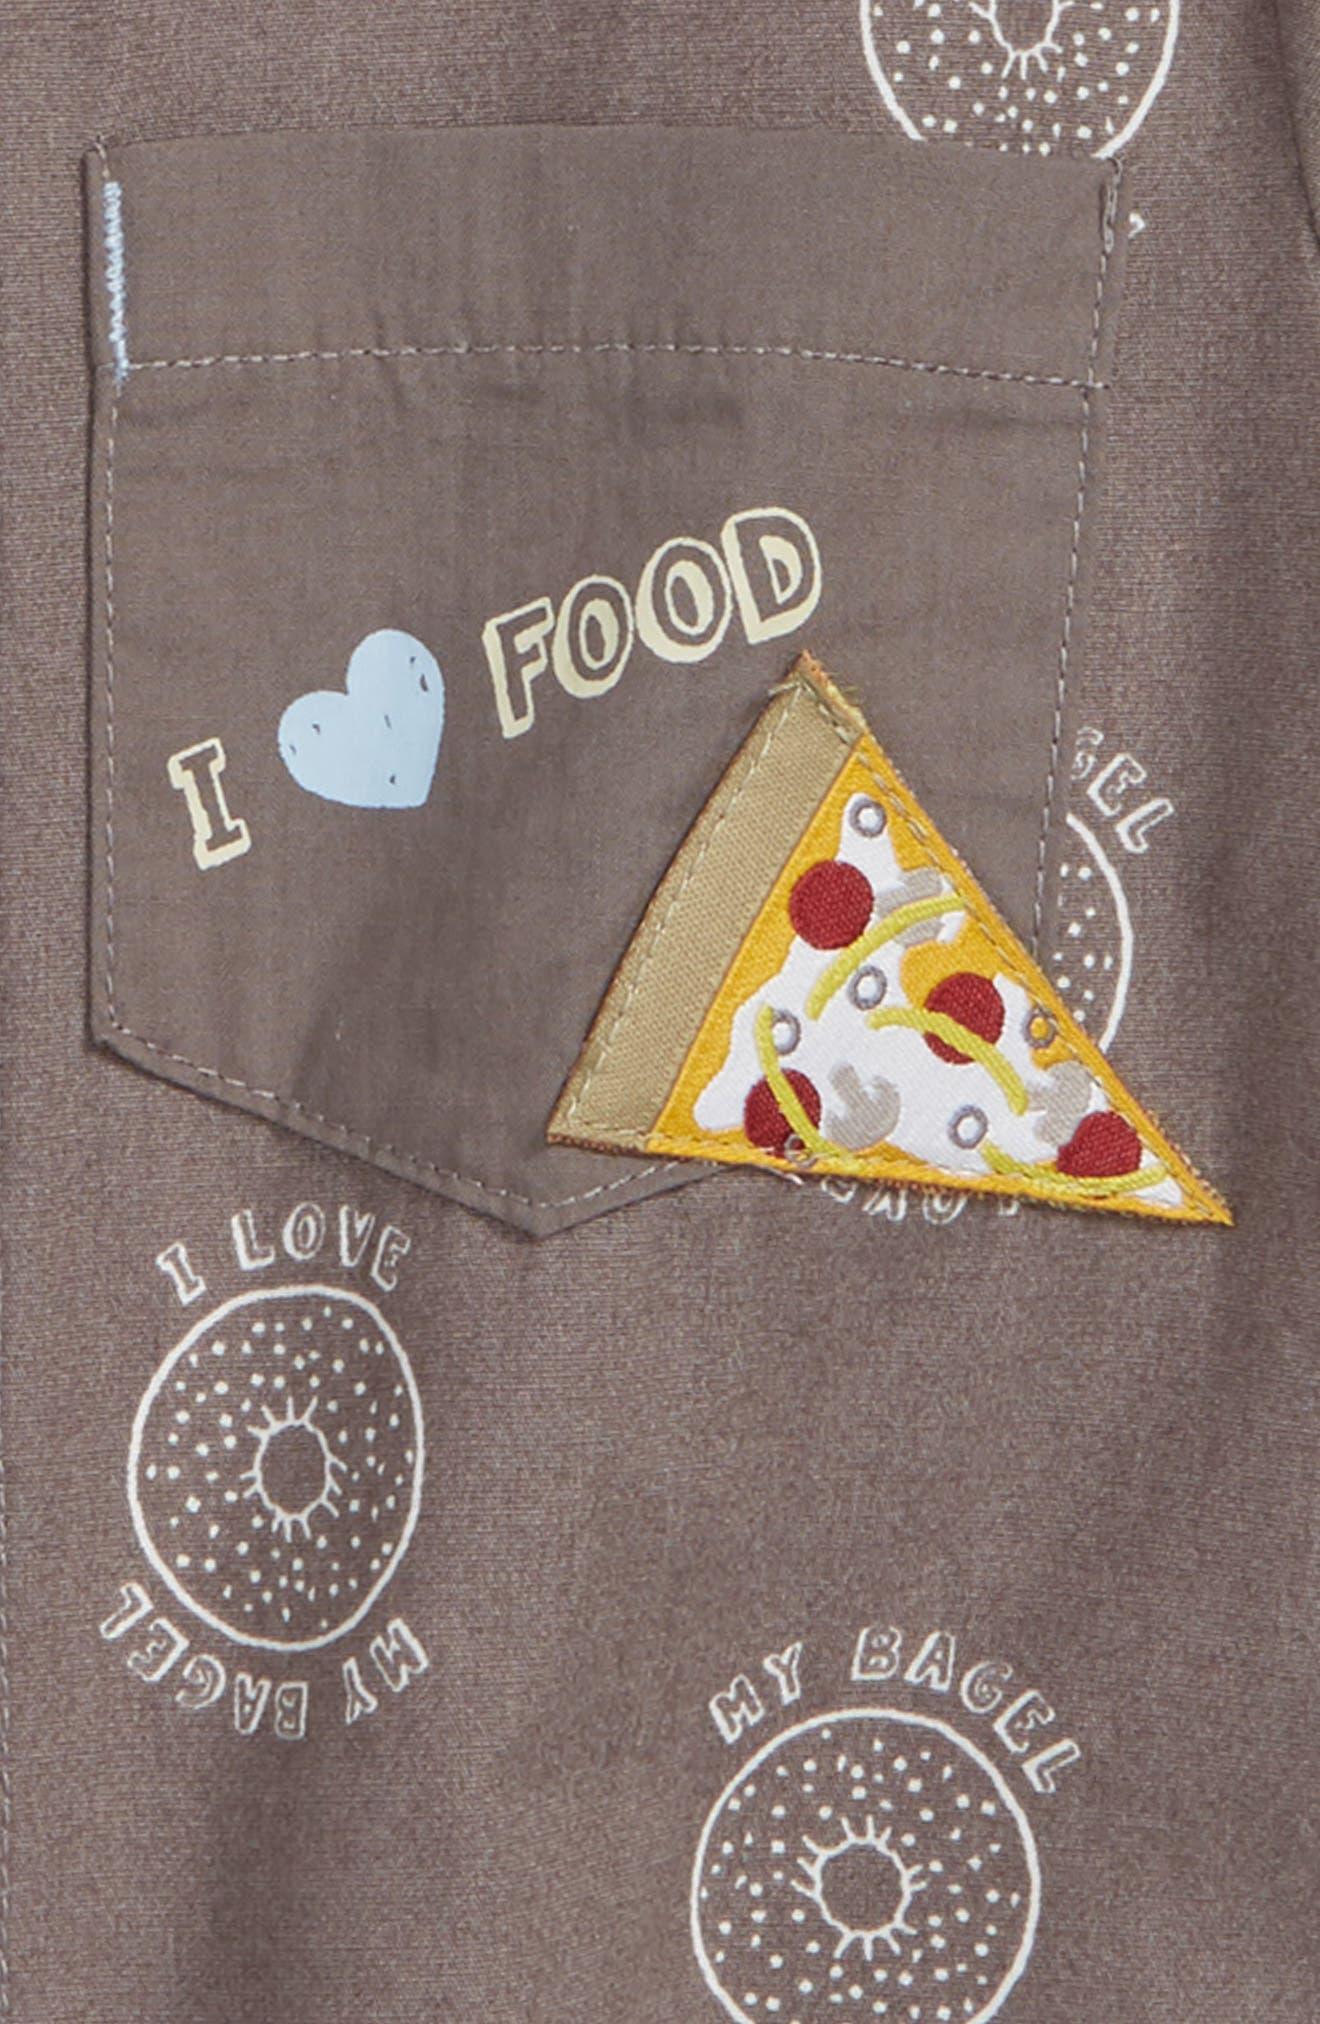 I Love My Bagel Woven Shirt,                             Alternate thumbnail 2, color,                             Charcoal